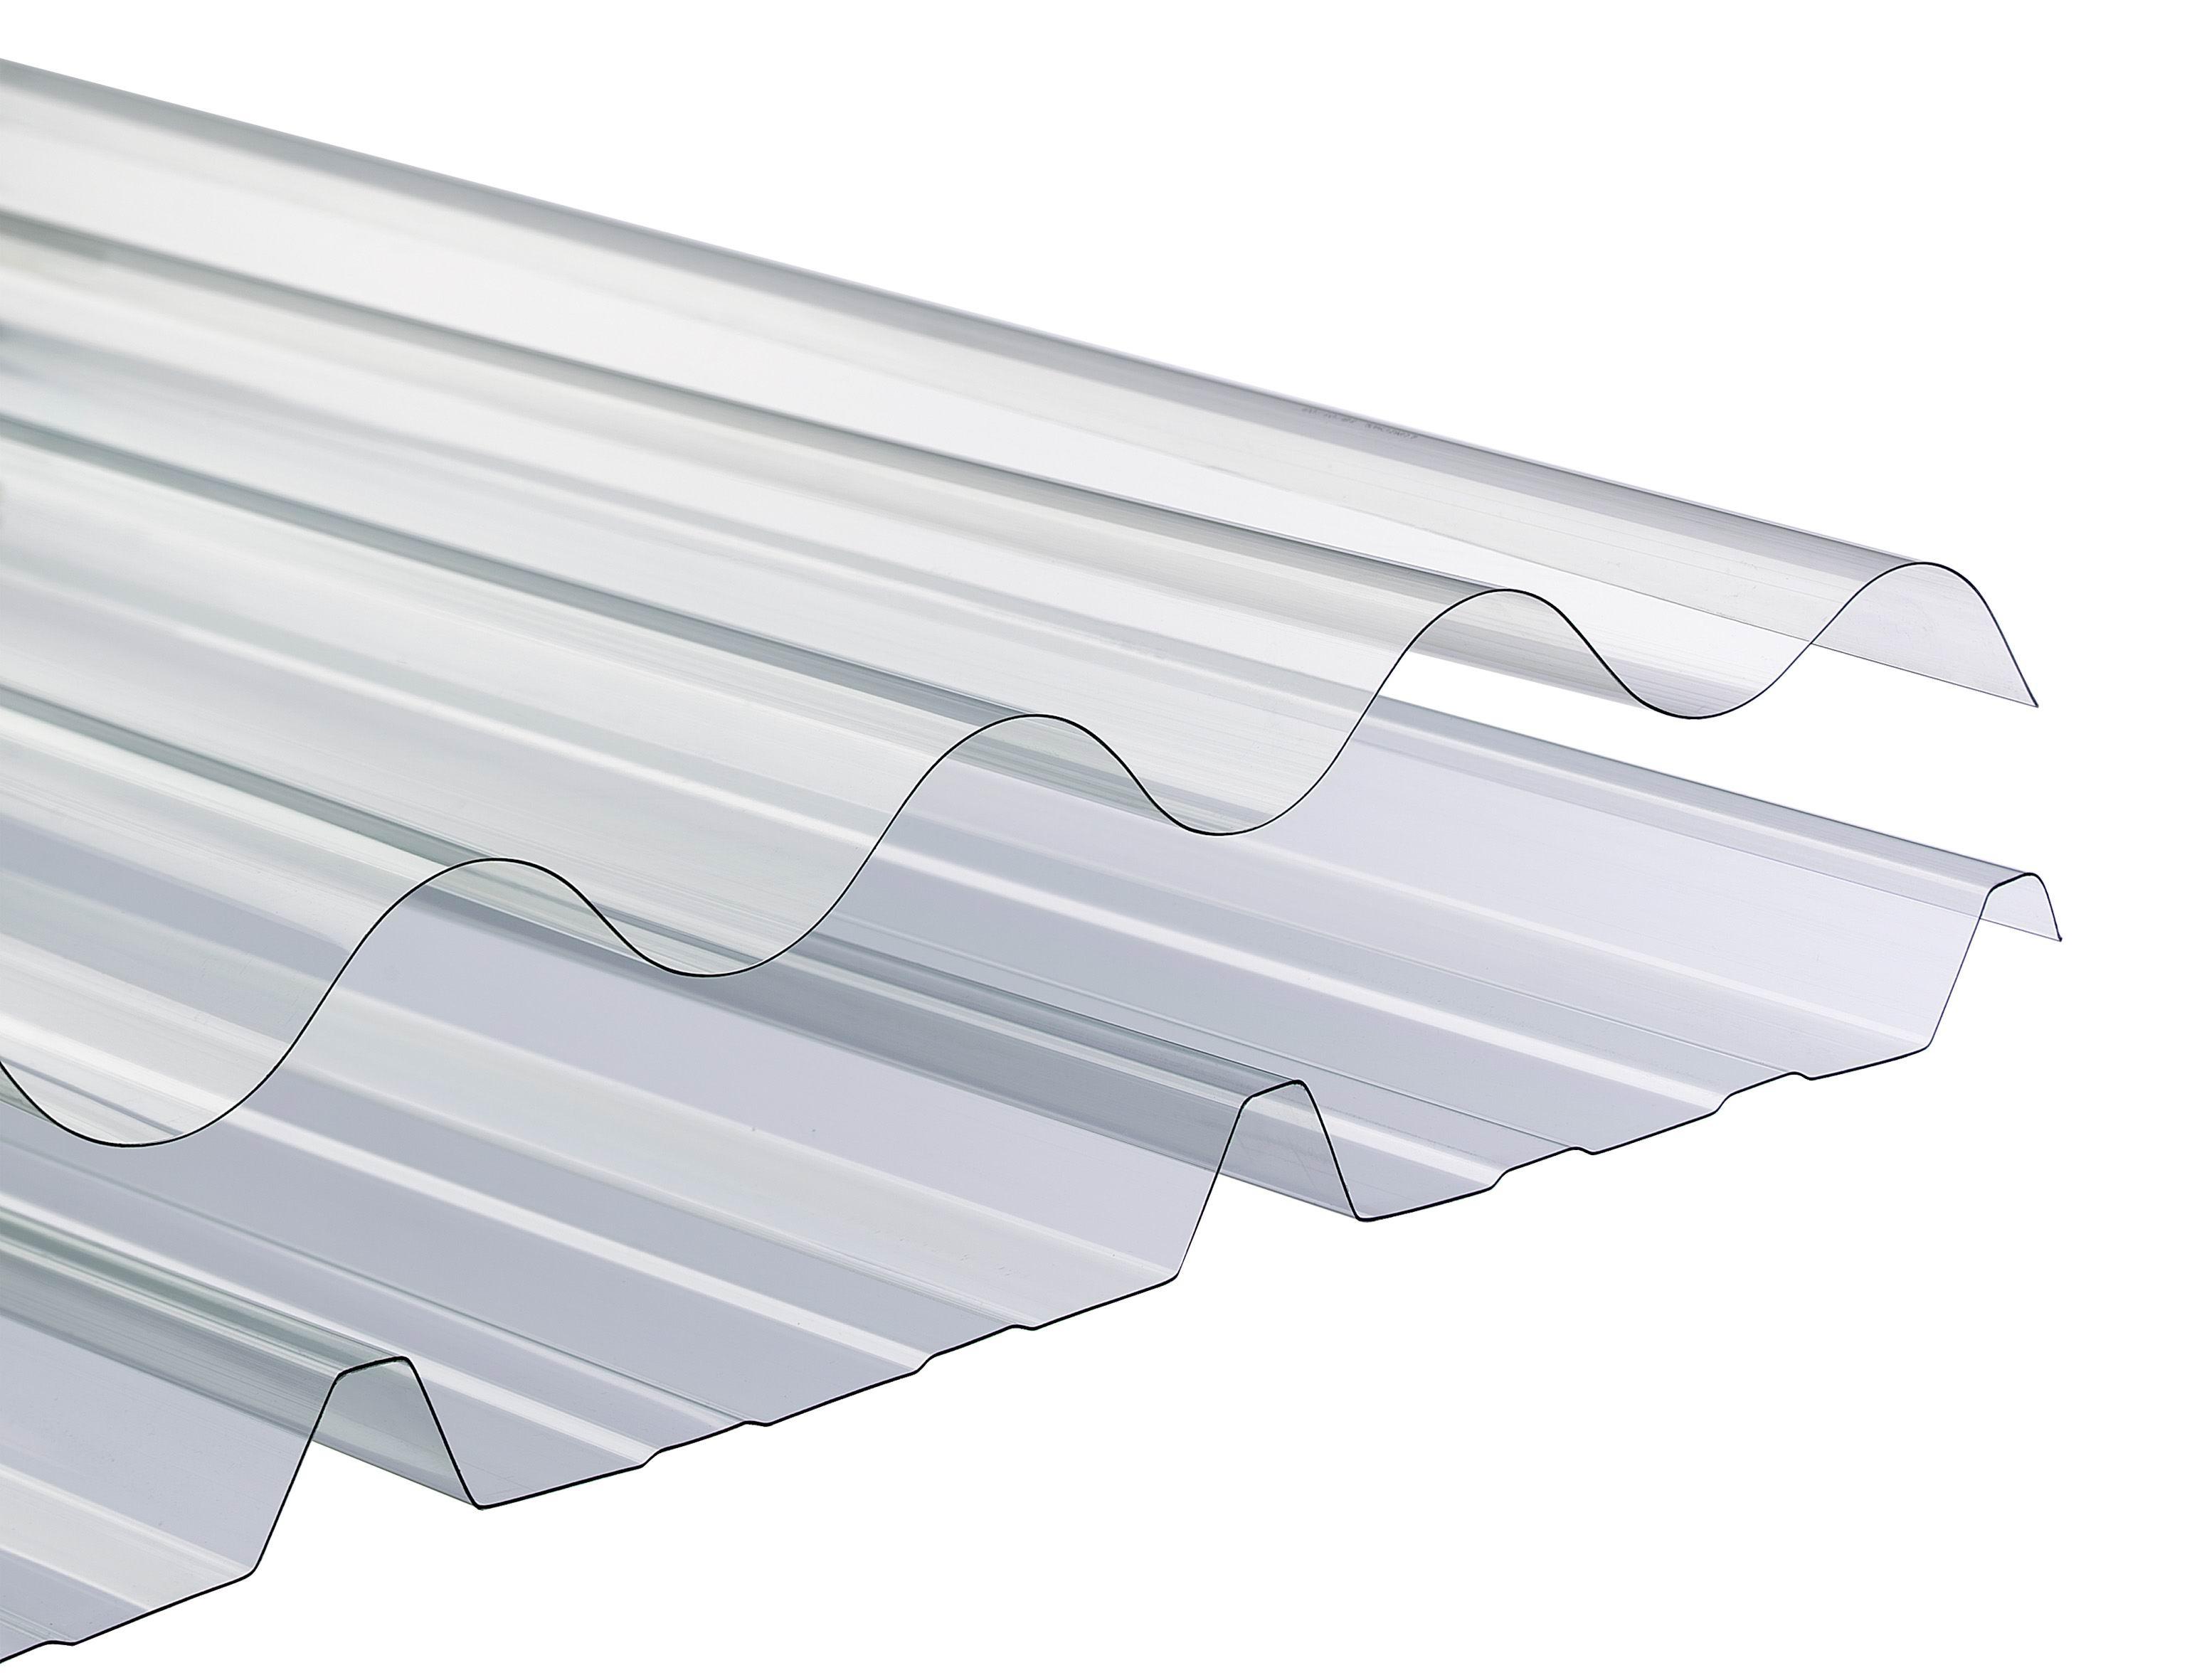 onduline plaque ondul e transparente polycarbonate 1 58. Black Bedroom Furniture Sets. Home Design Ideas